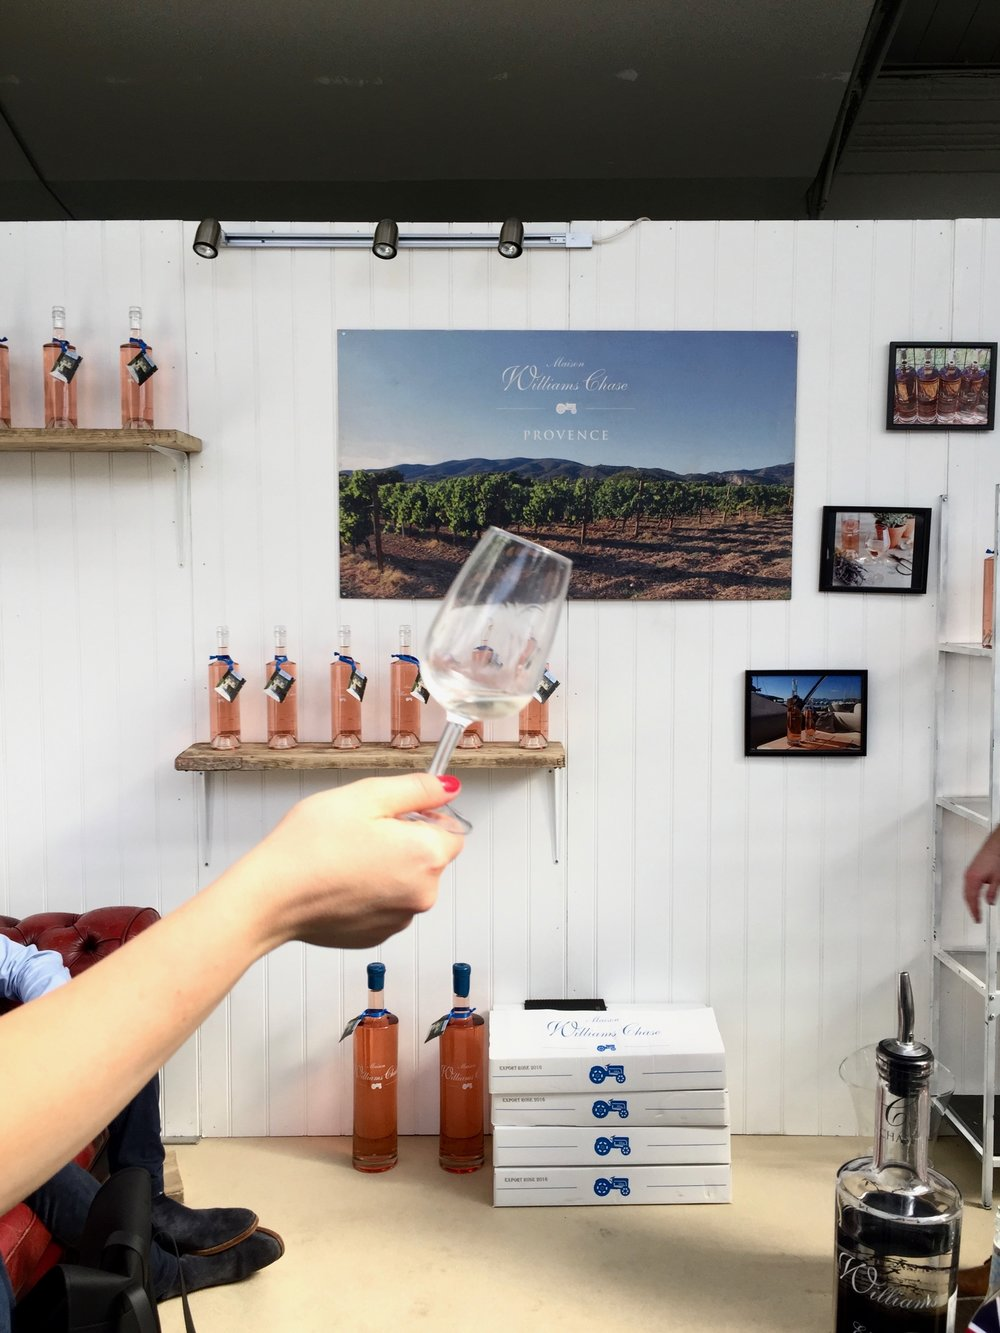 Bottle Bitches drink Williams Chase 2014 Papillon Constantin Blanc at London Wine Fair 2017.jpg